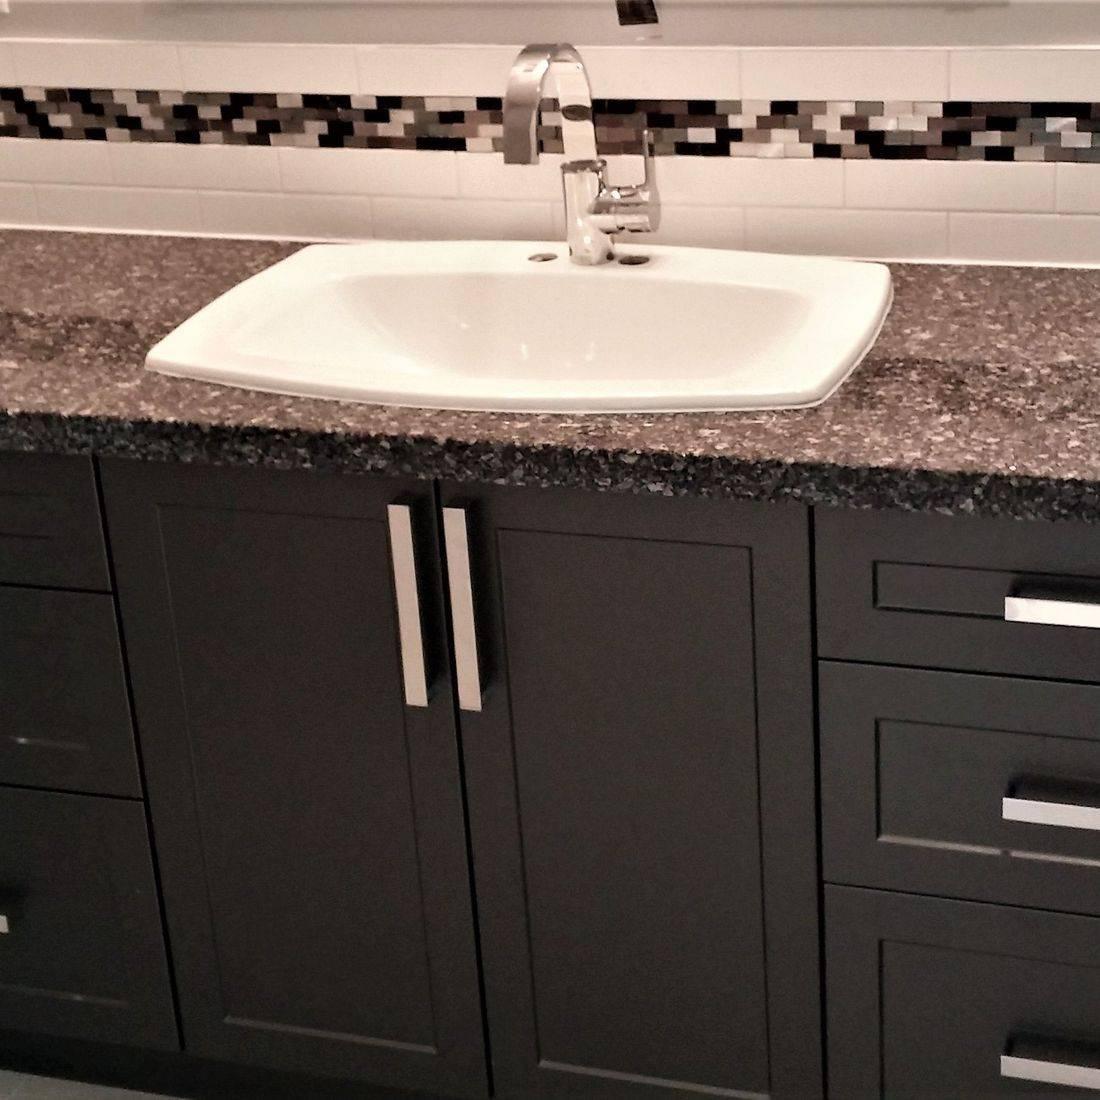 Sibra Kitchens Markham Toronto cabinets bathroon vanity